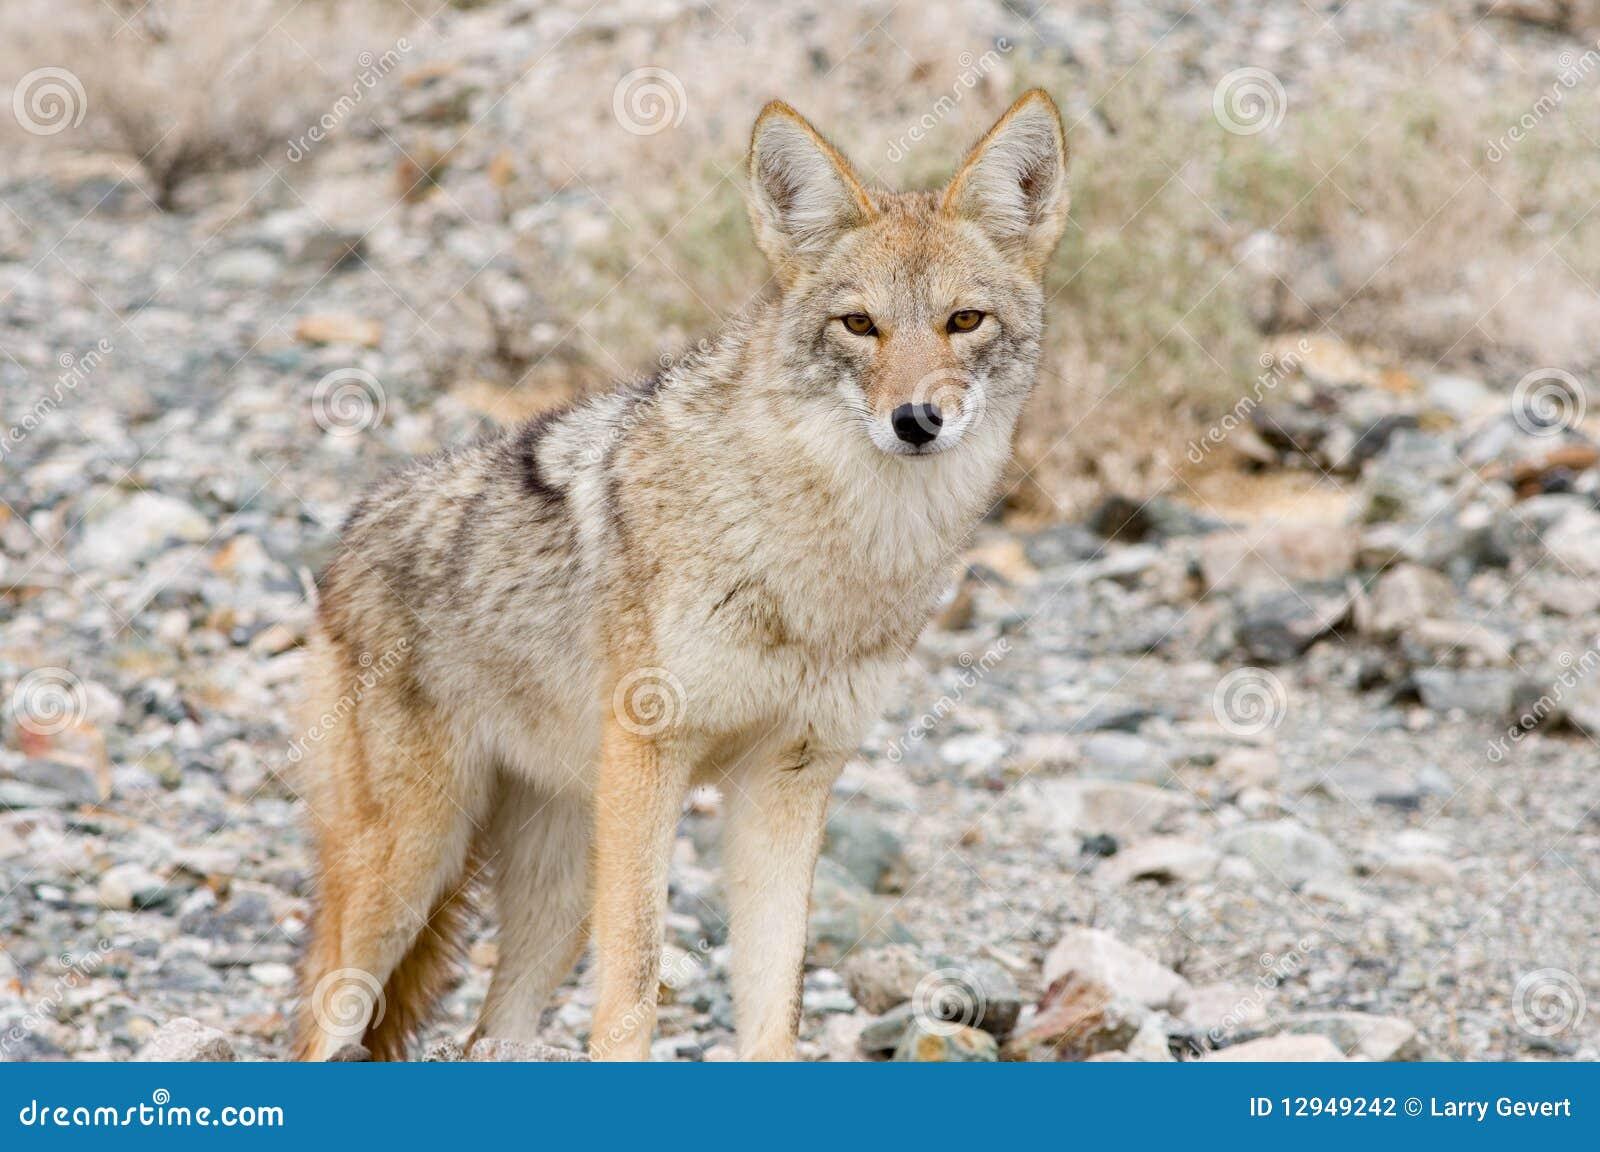 Desert coyote pictures - photo#28